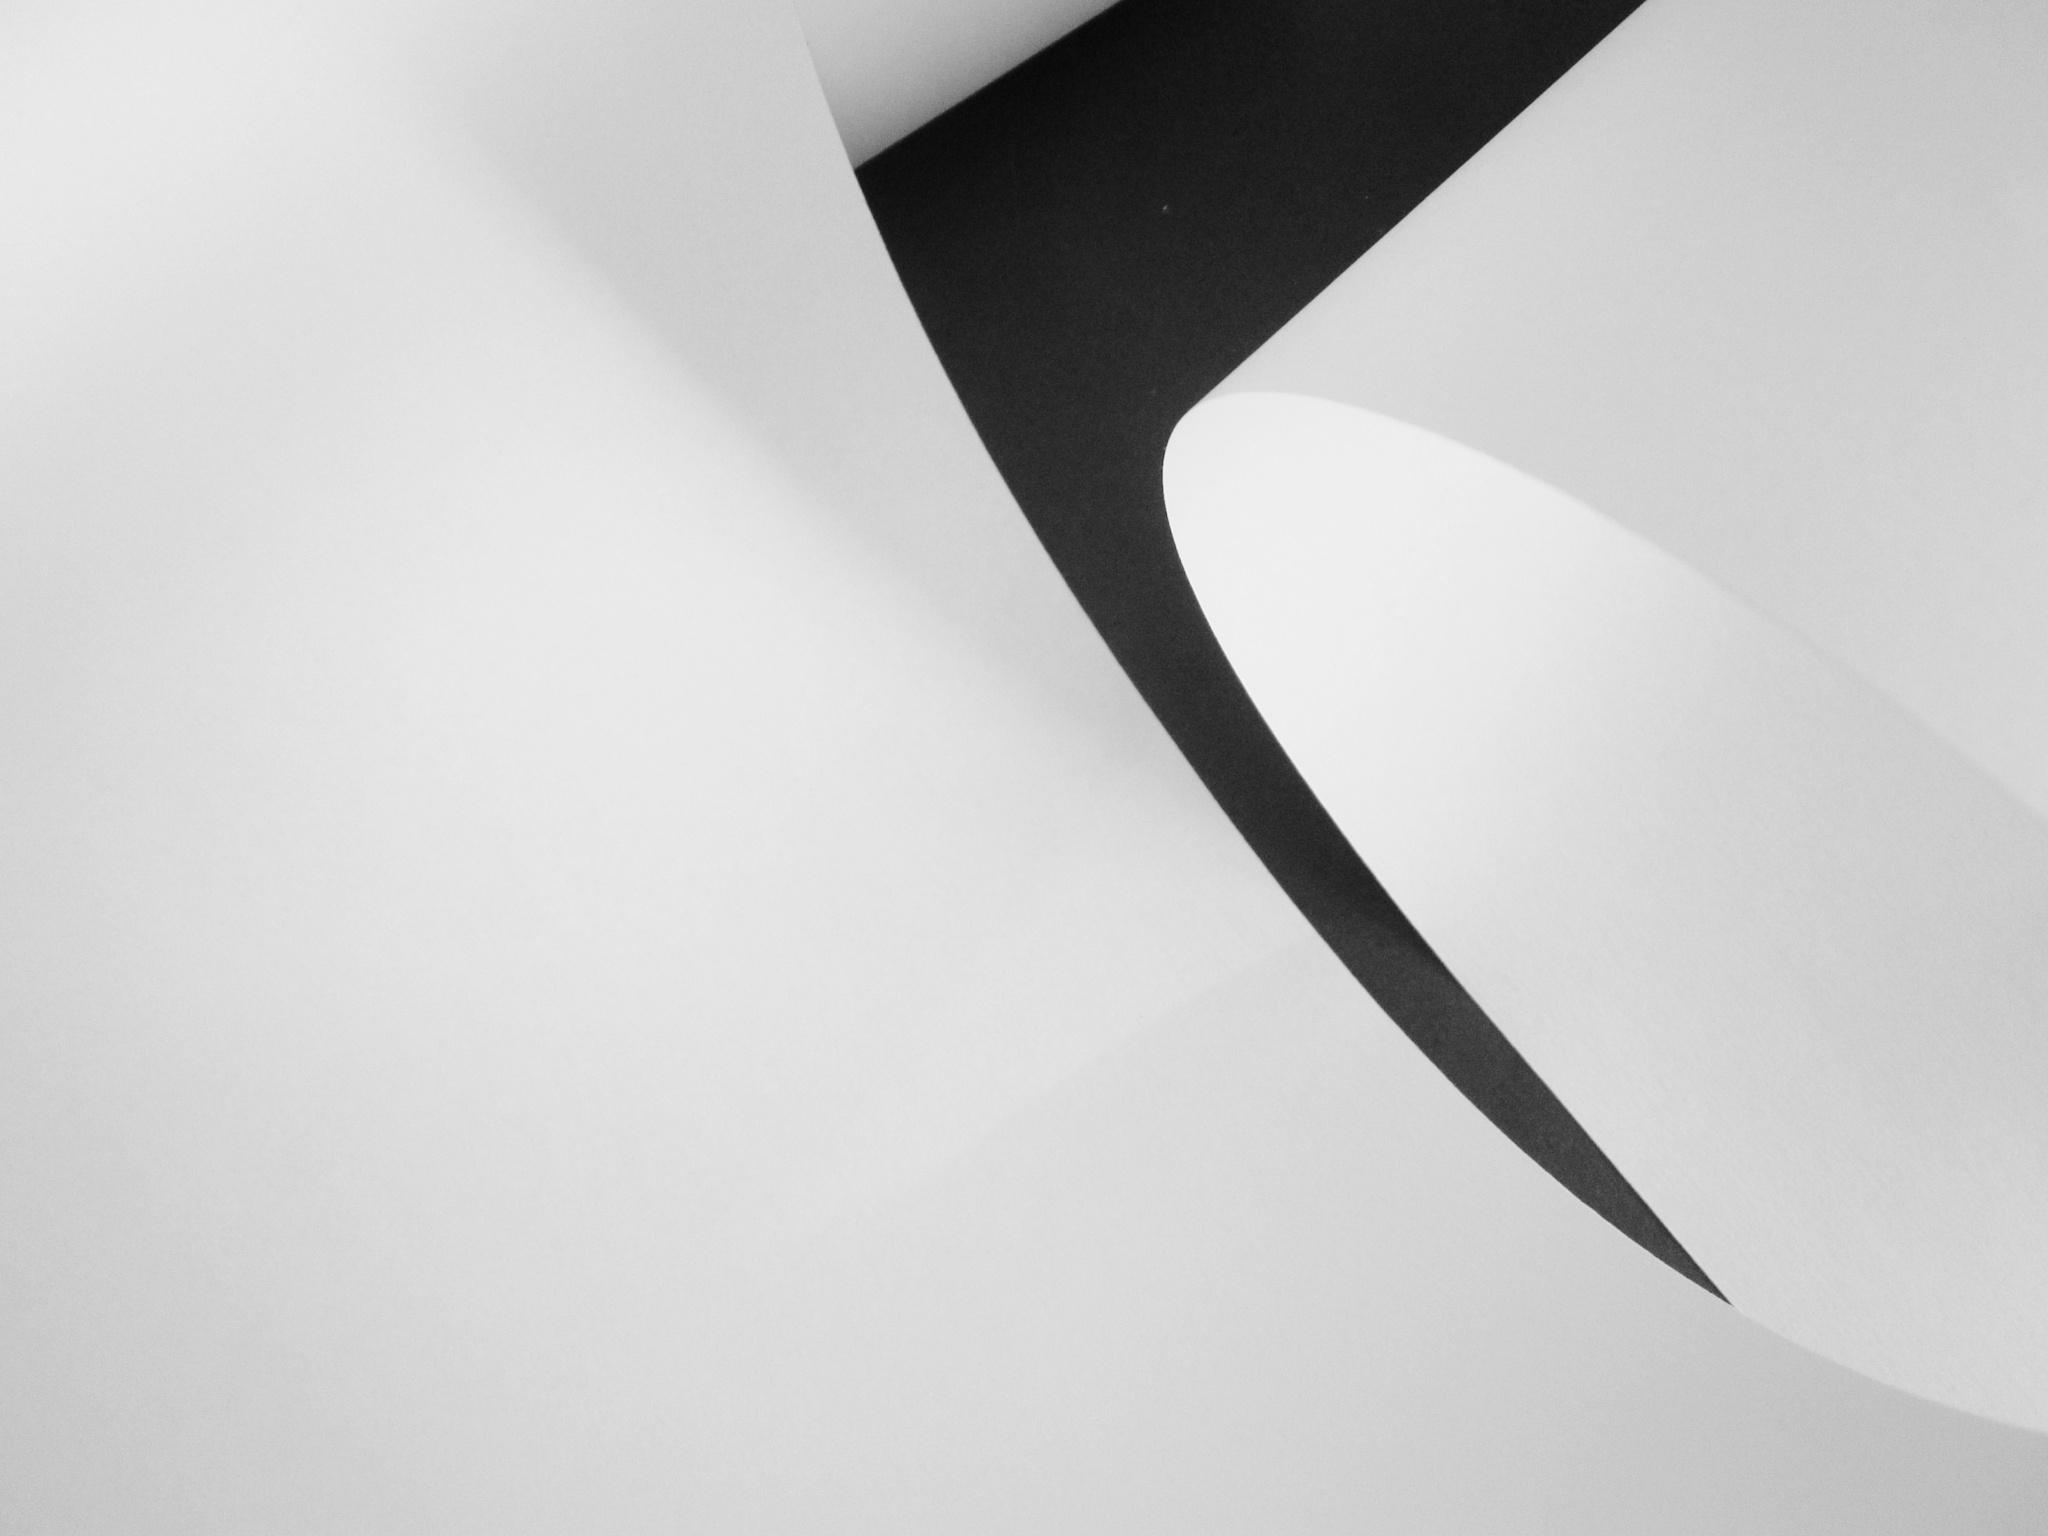 papiersnede by pierrevandenbroeck1